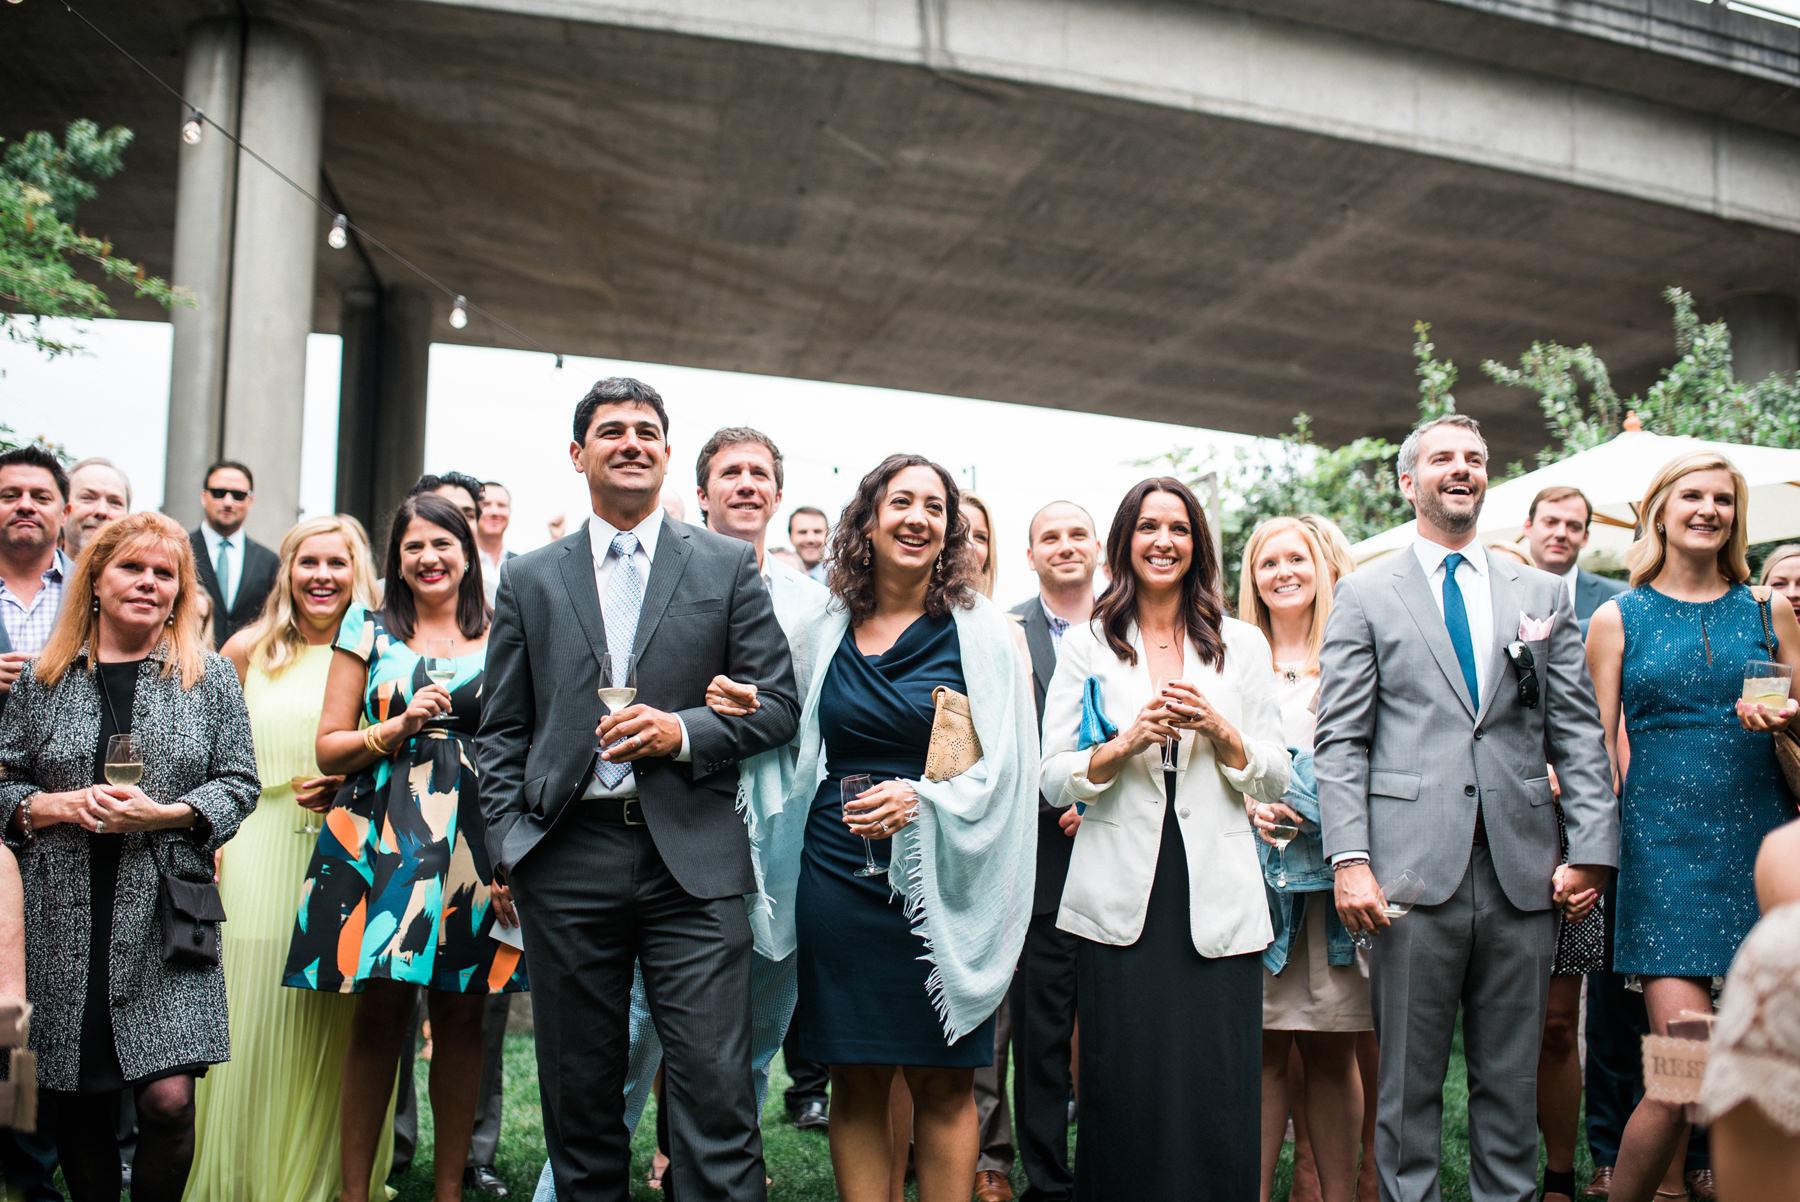 208-outdoor-wedding-ceremony-at-the-corson-building.jpg